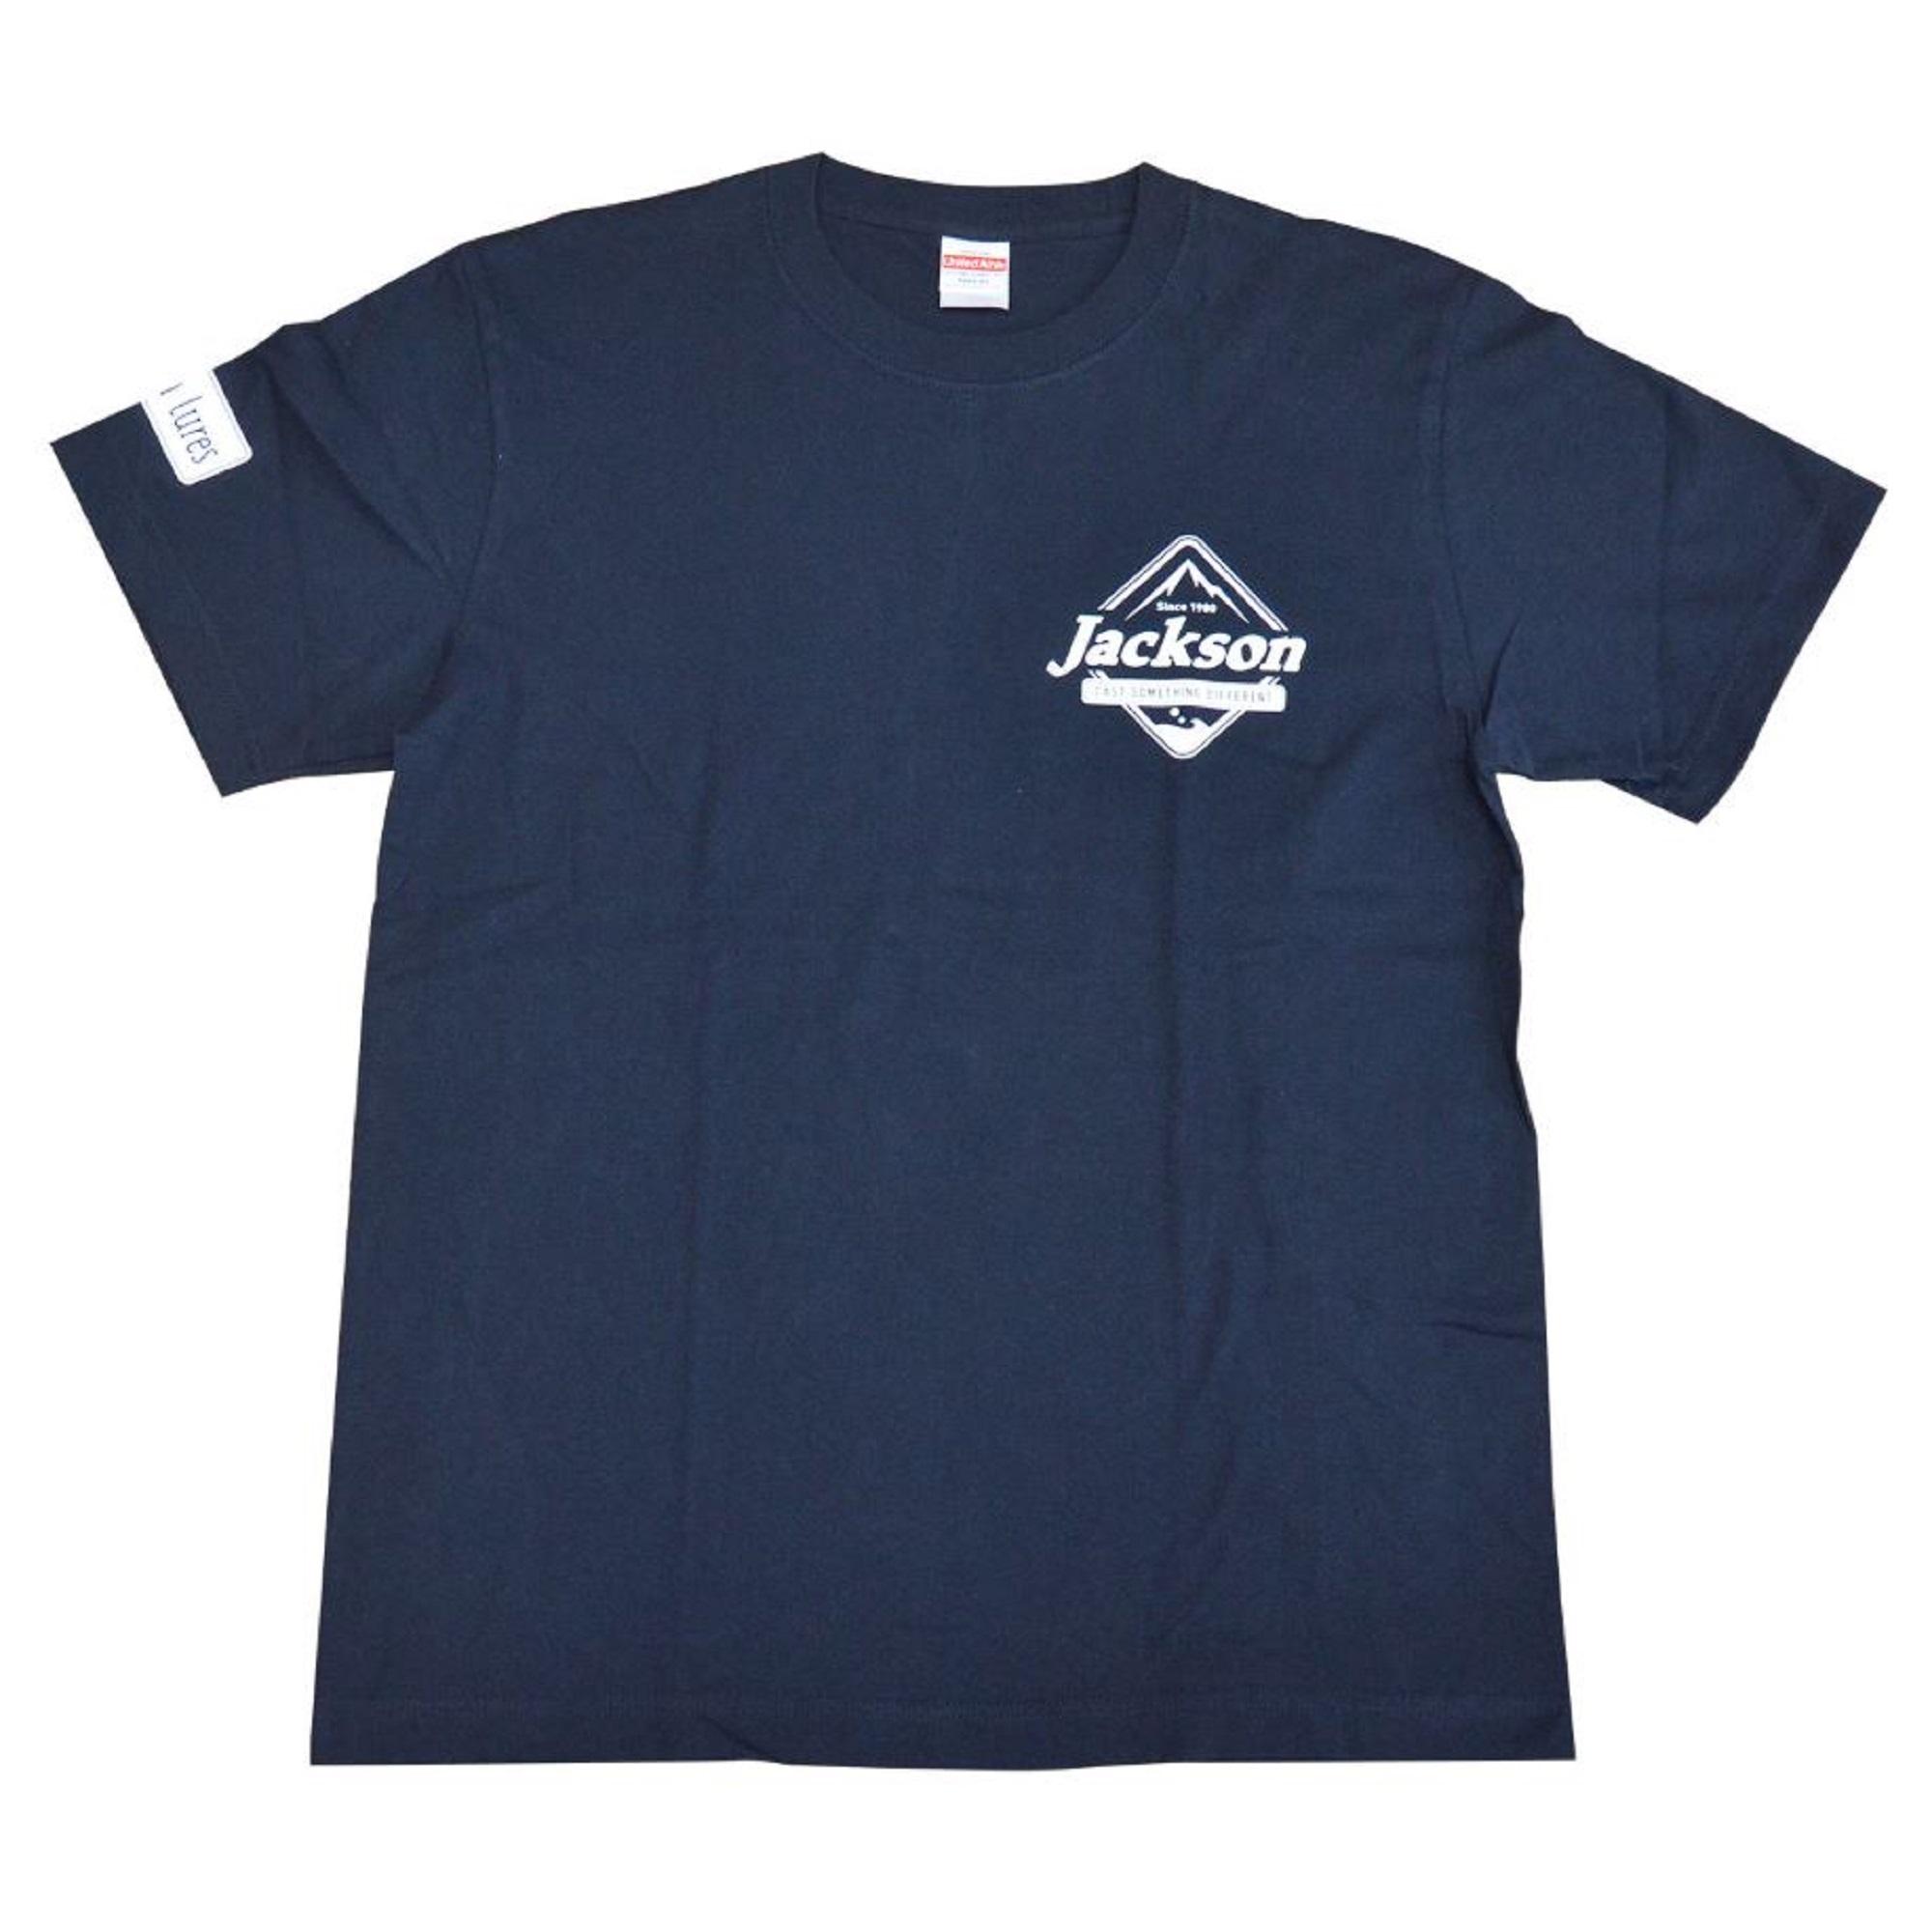 Jackson T-shirt Logo Tee Navy L (9052)